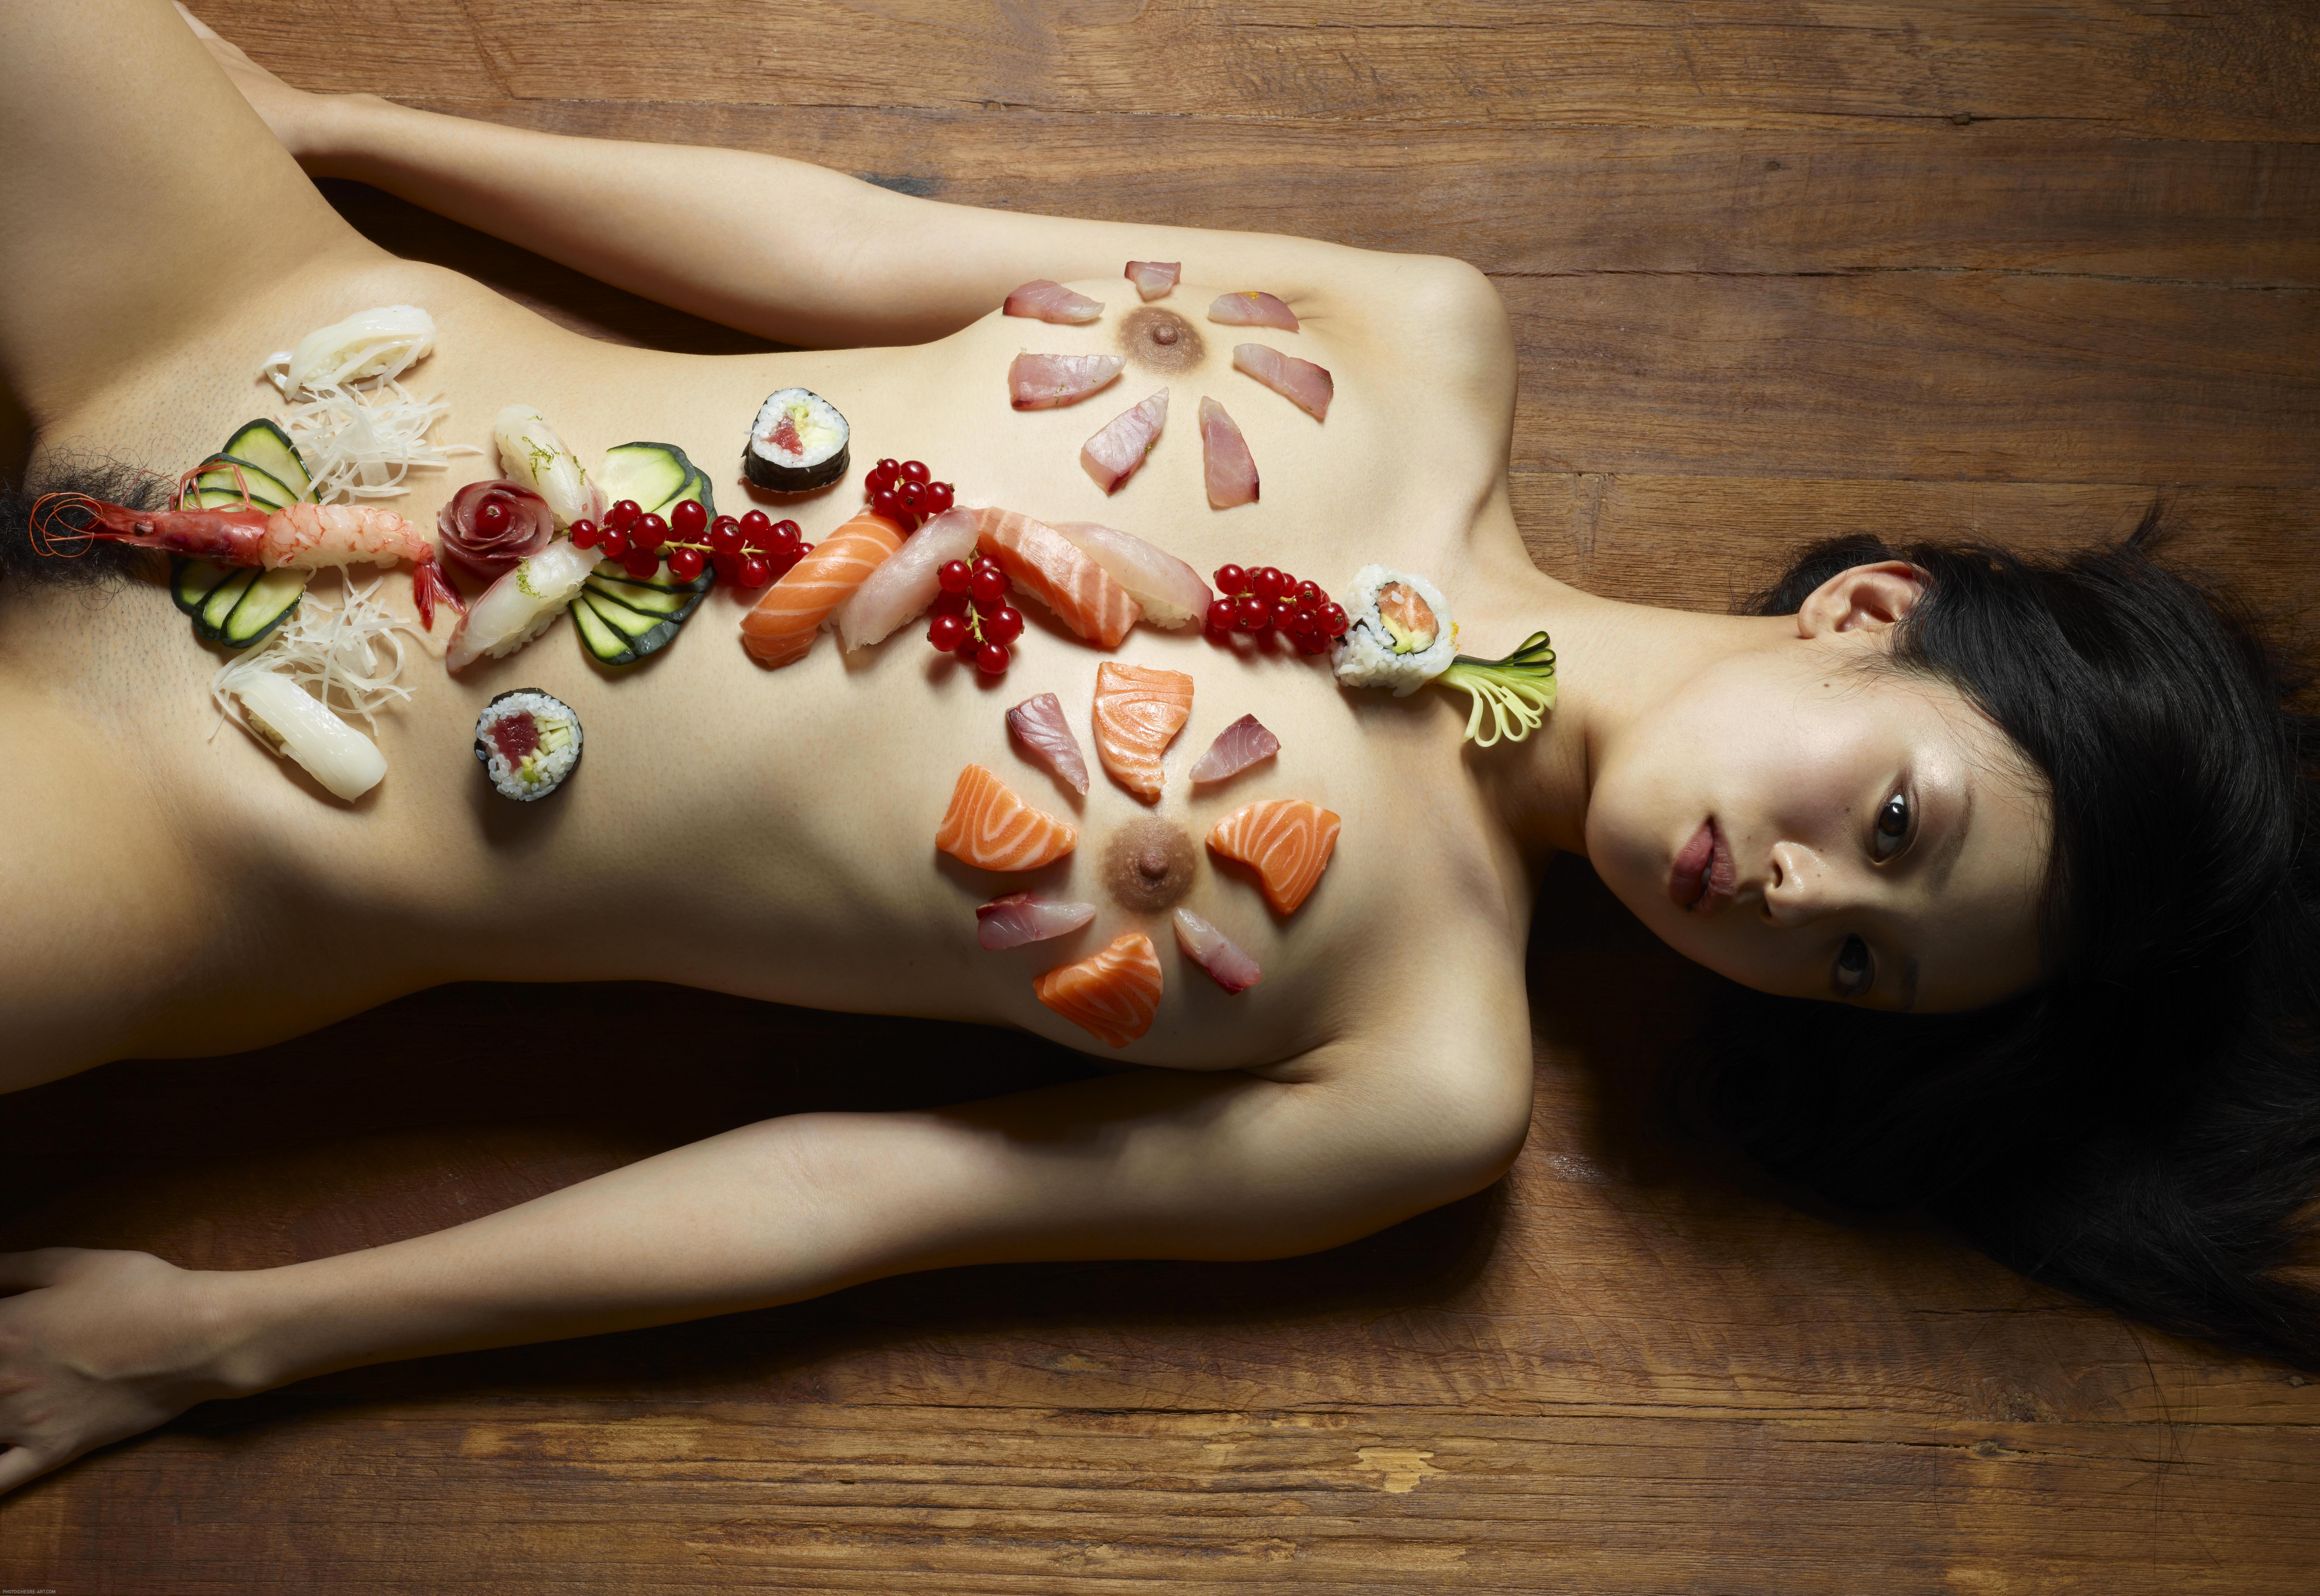 Hegre art konata serving sushi